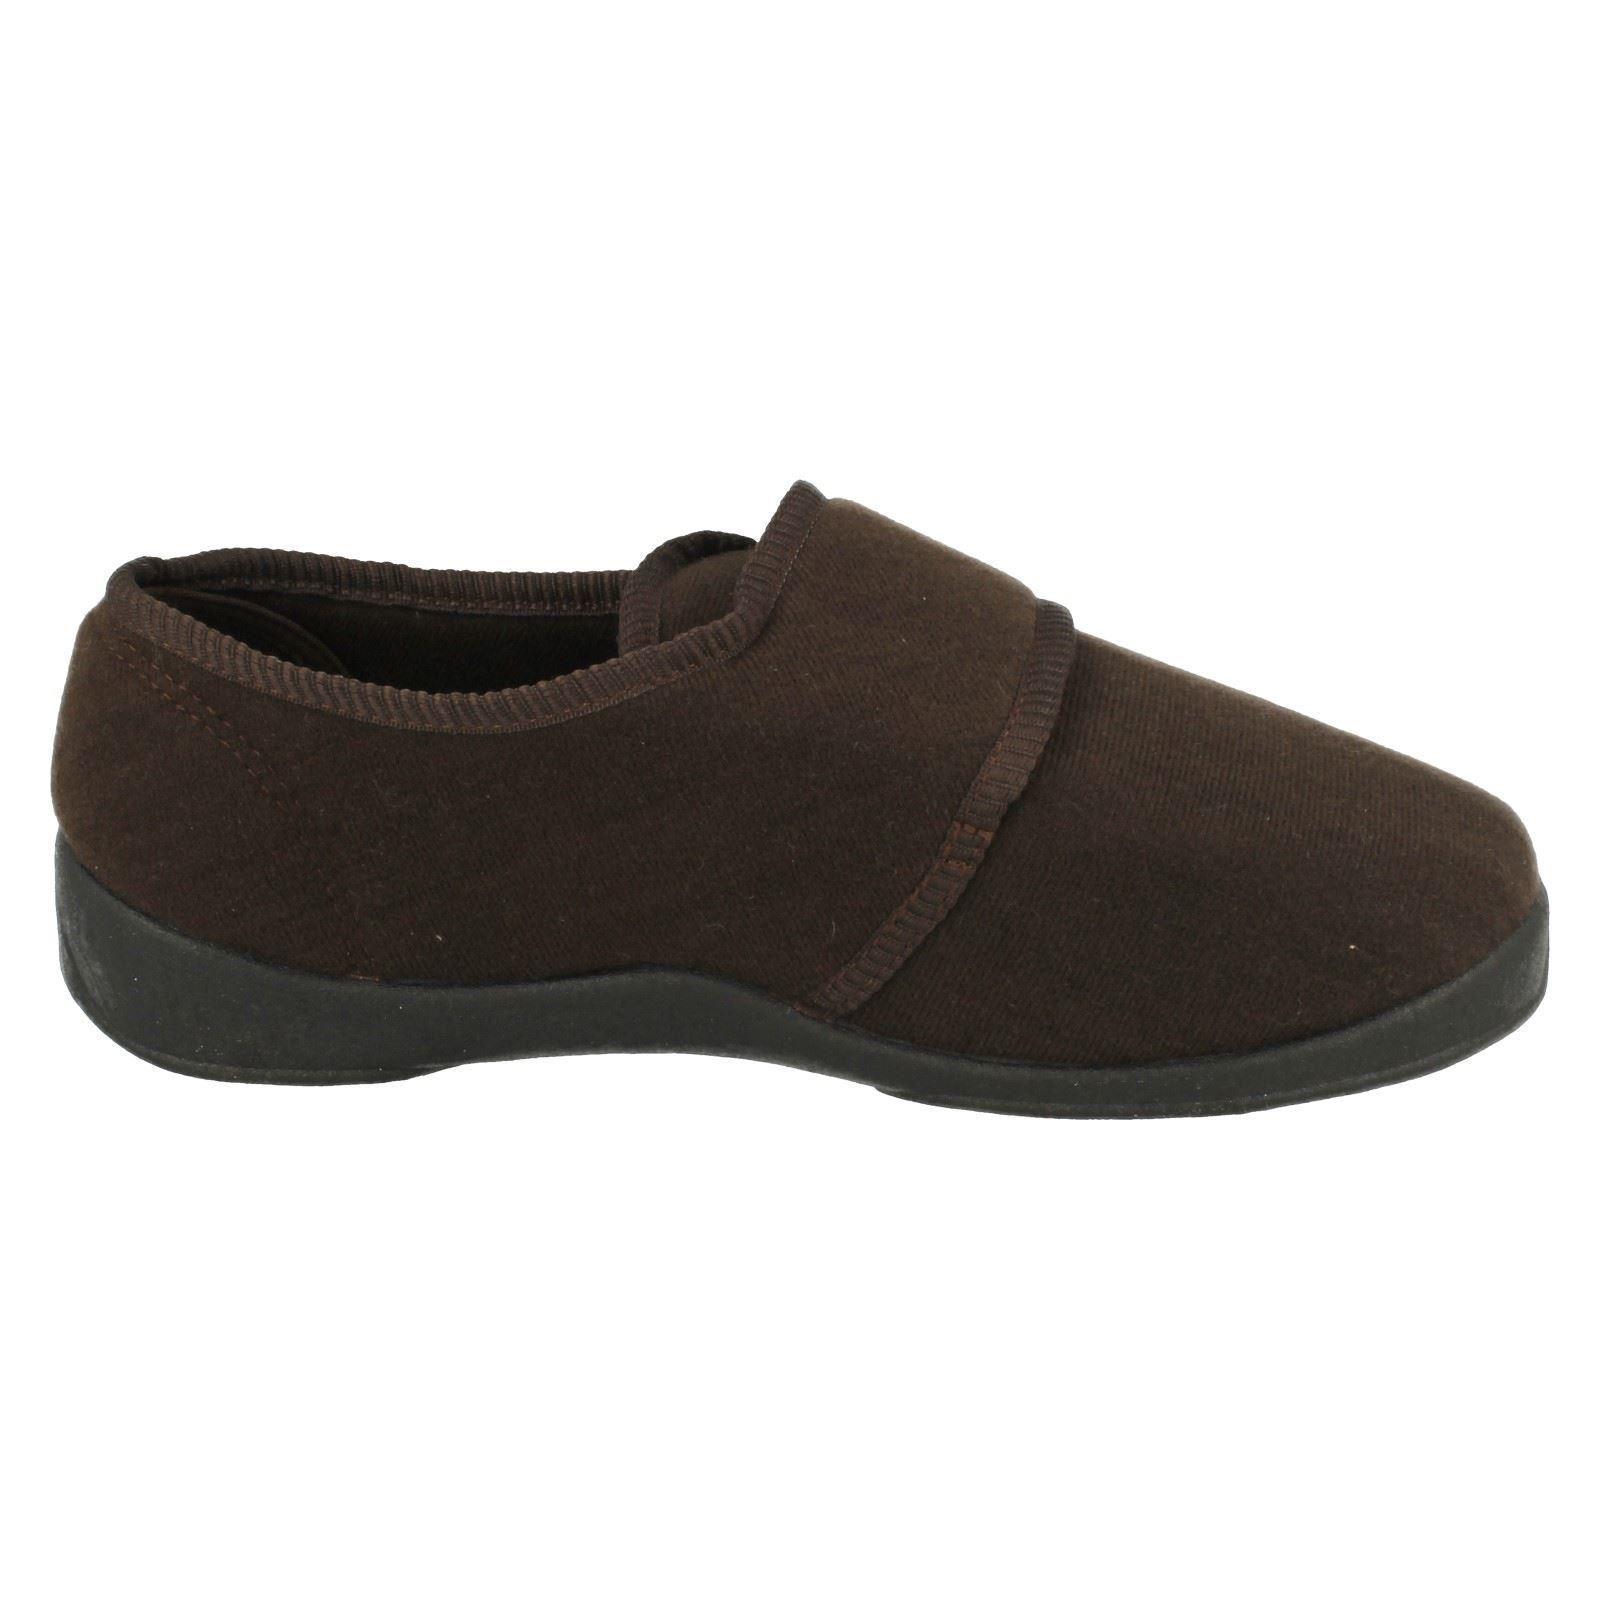 Zapatillas para hombre NatureForm Etiqueta George-W